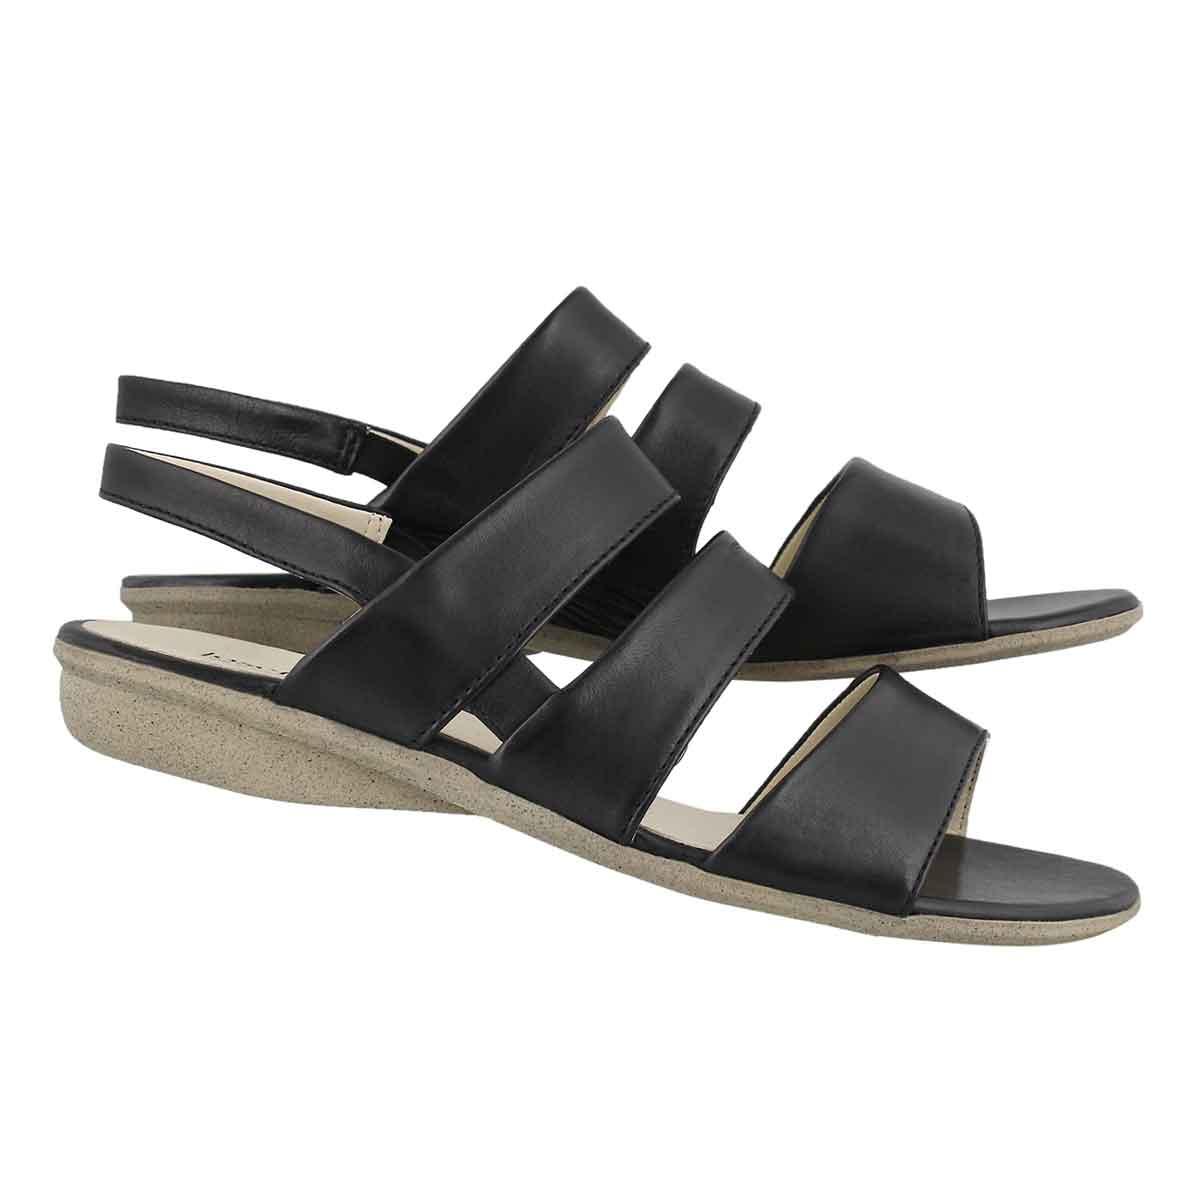 Lds Fabia 11 black dress sandal